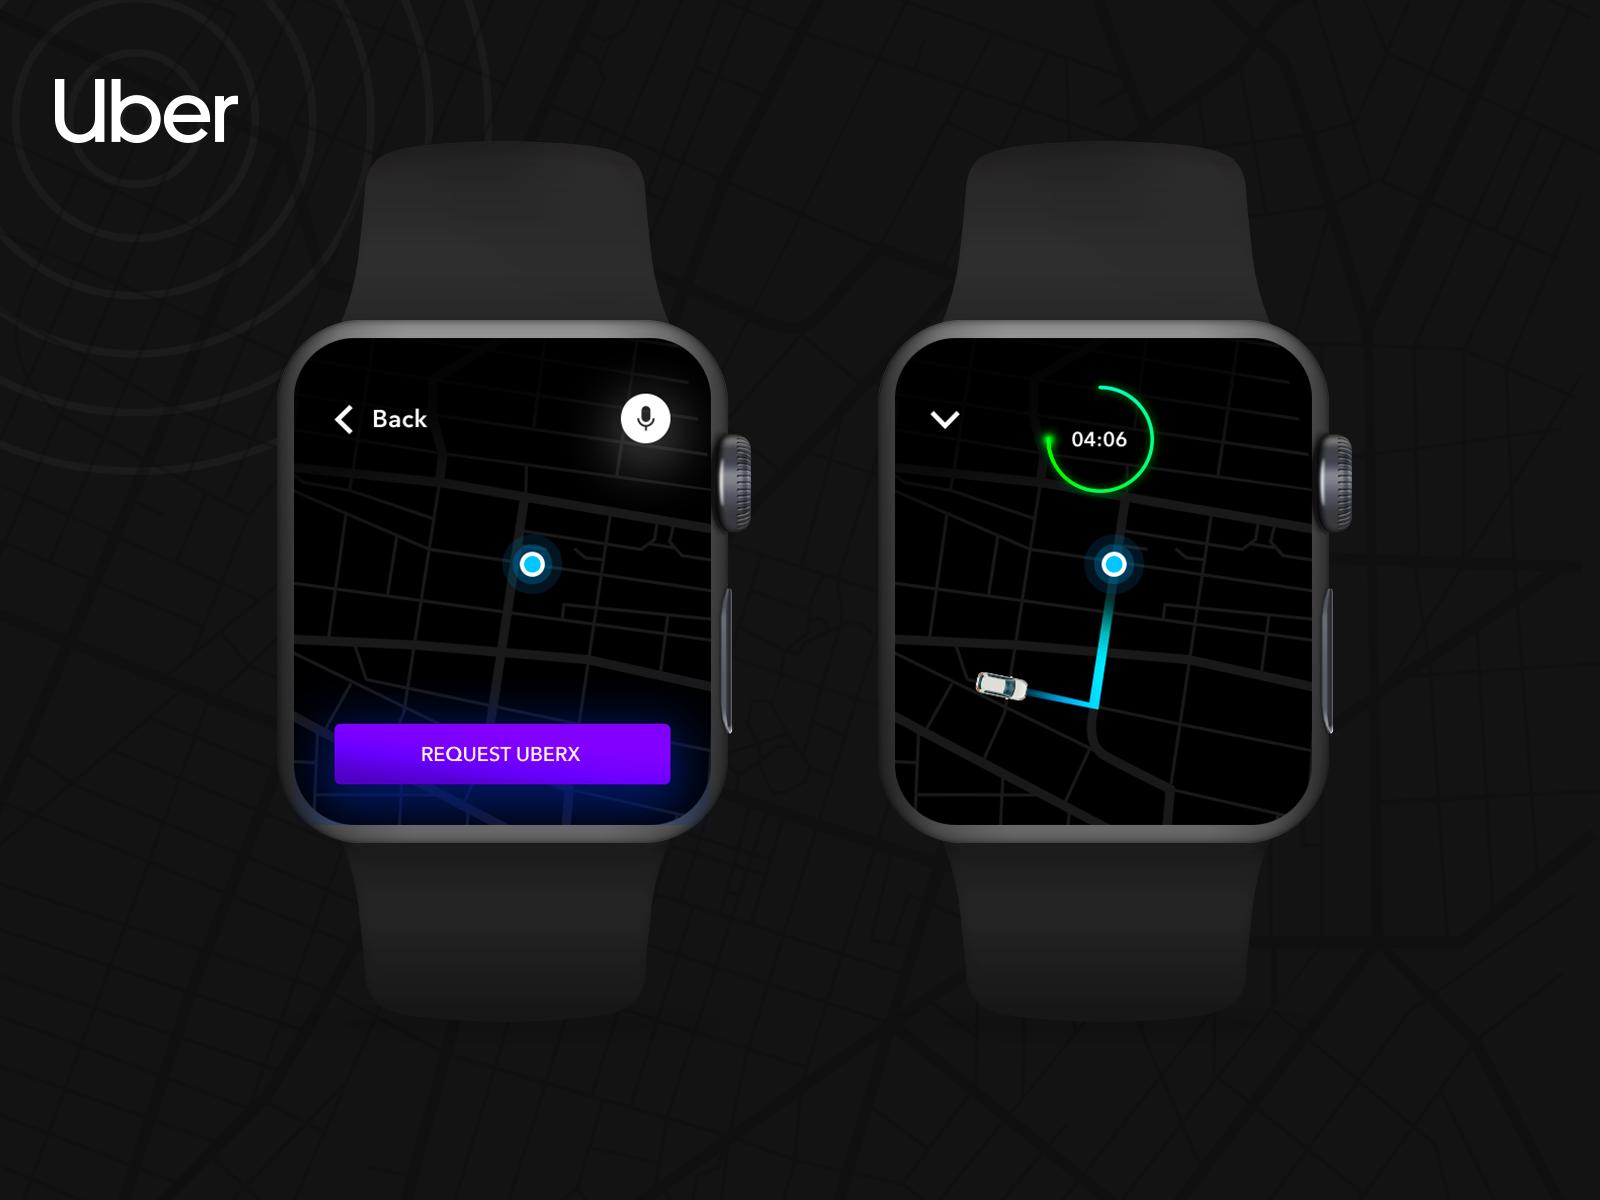 Uber Apple Watch